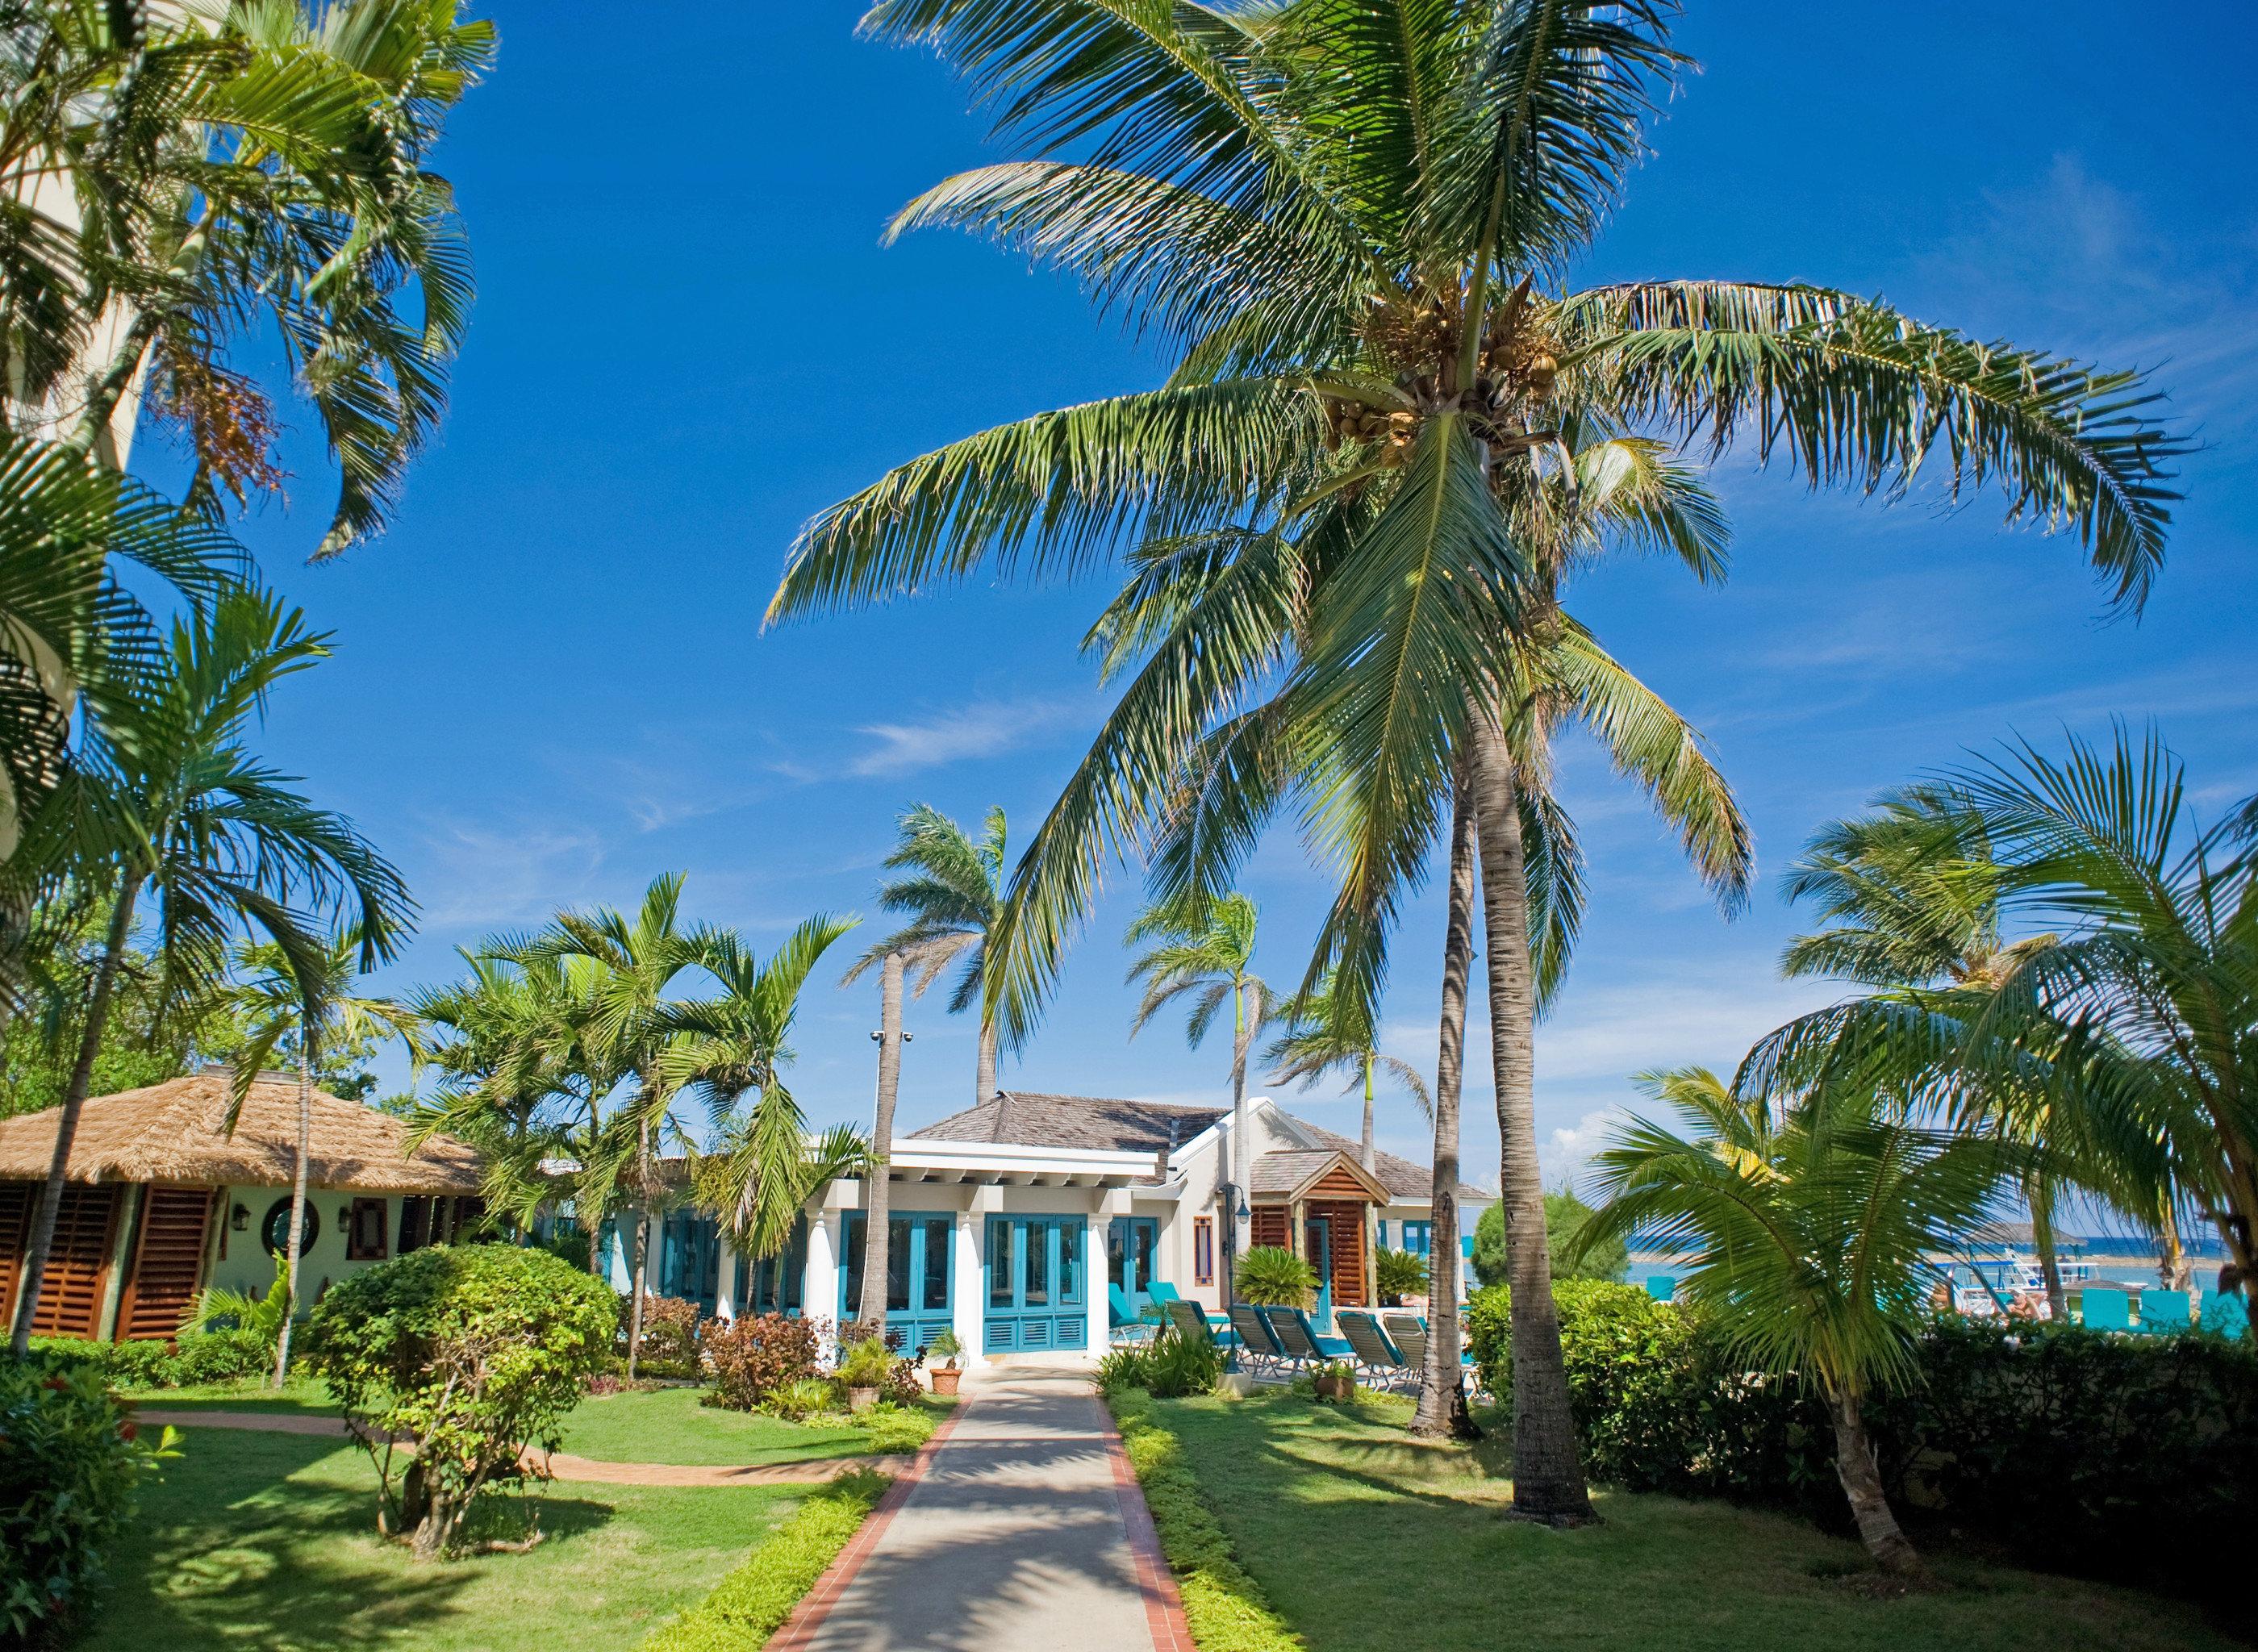 Grounds Island tree palm sky Resort palm family caribbean Beach arecales tropics lined plant Garden shade bushes